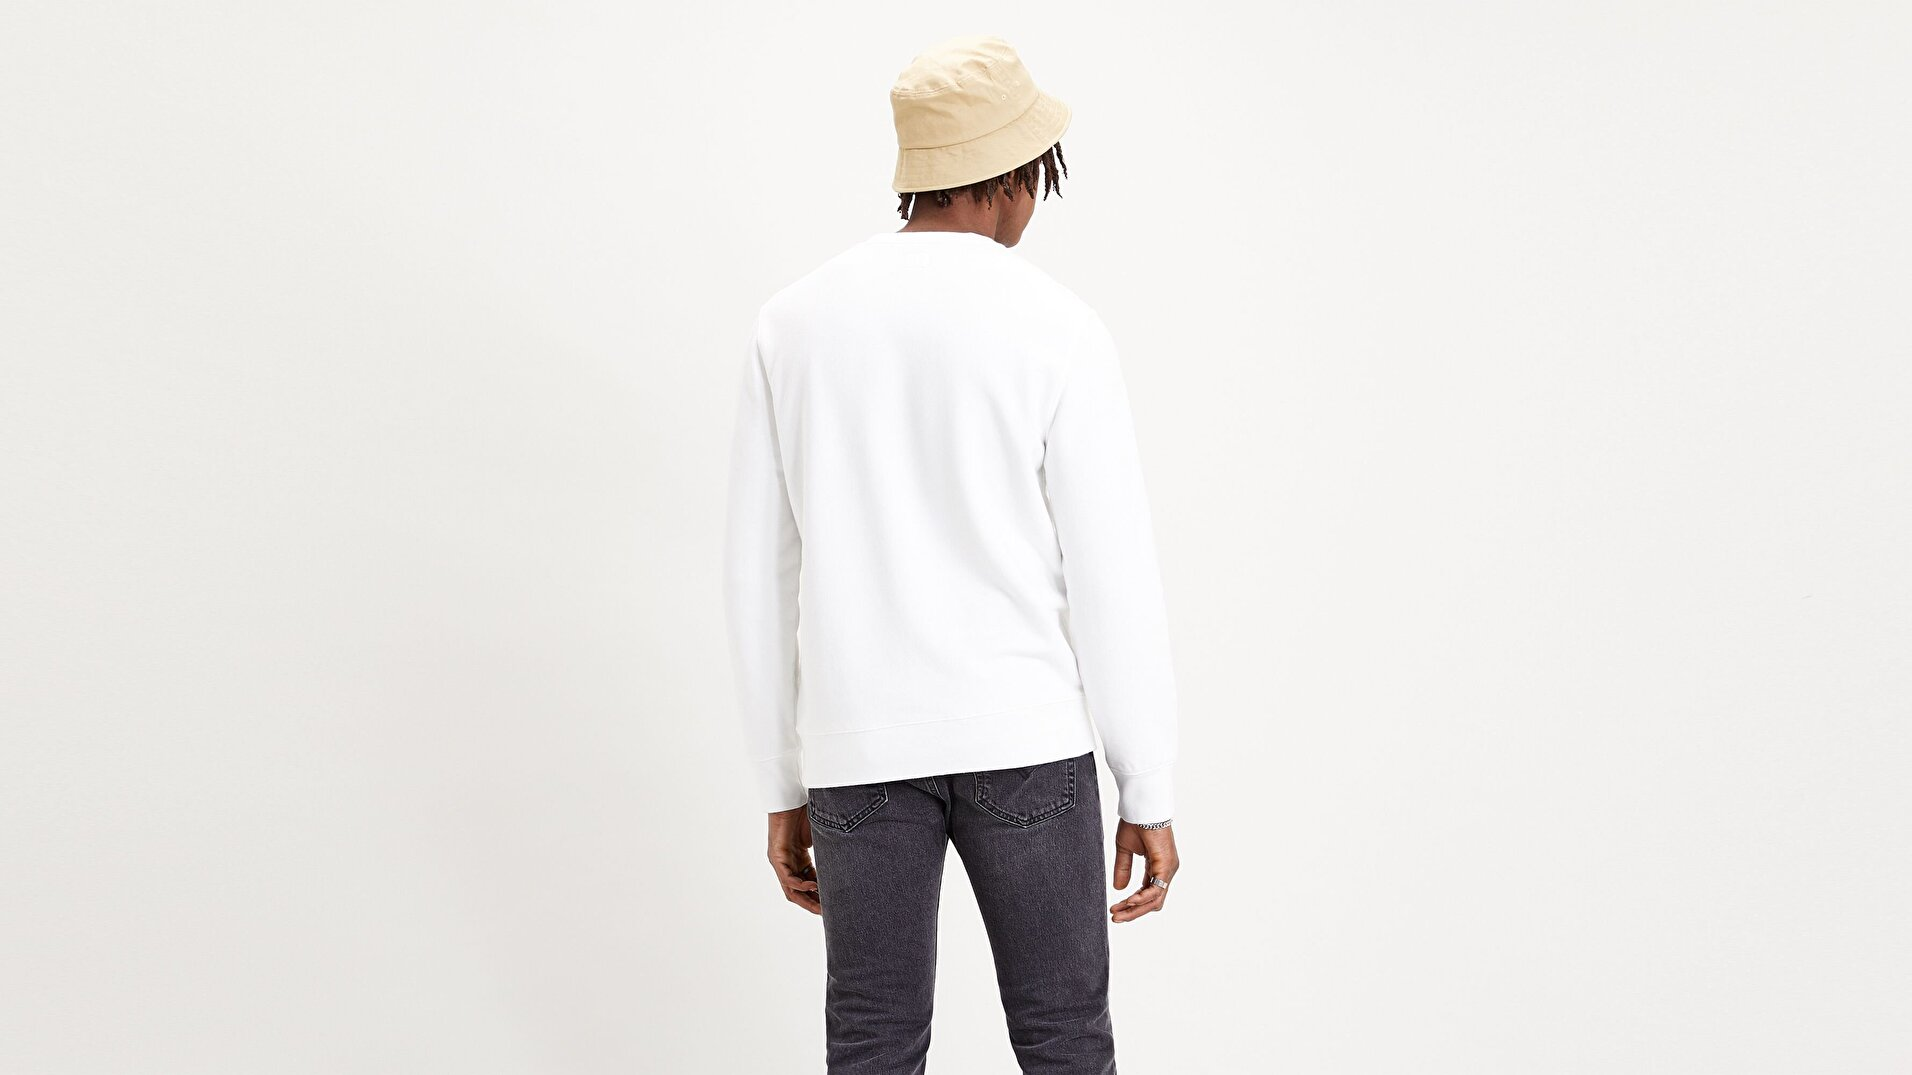 New Original Crew Beyaz Erkek Sweatshirt